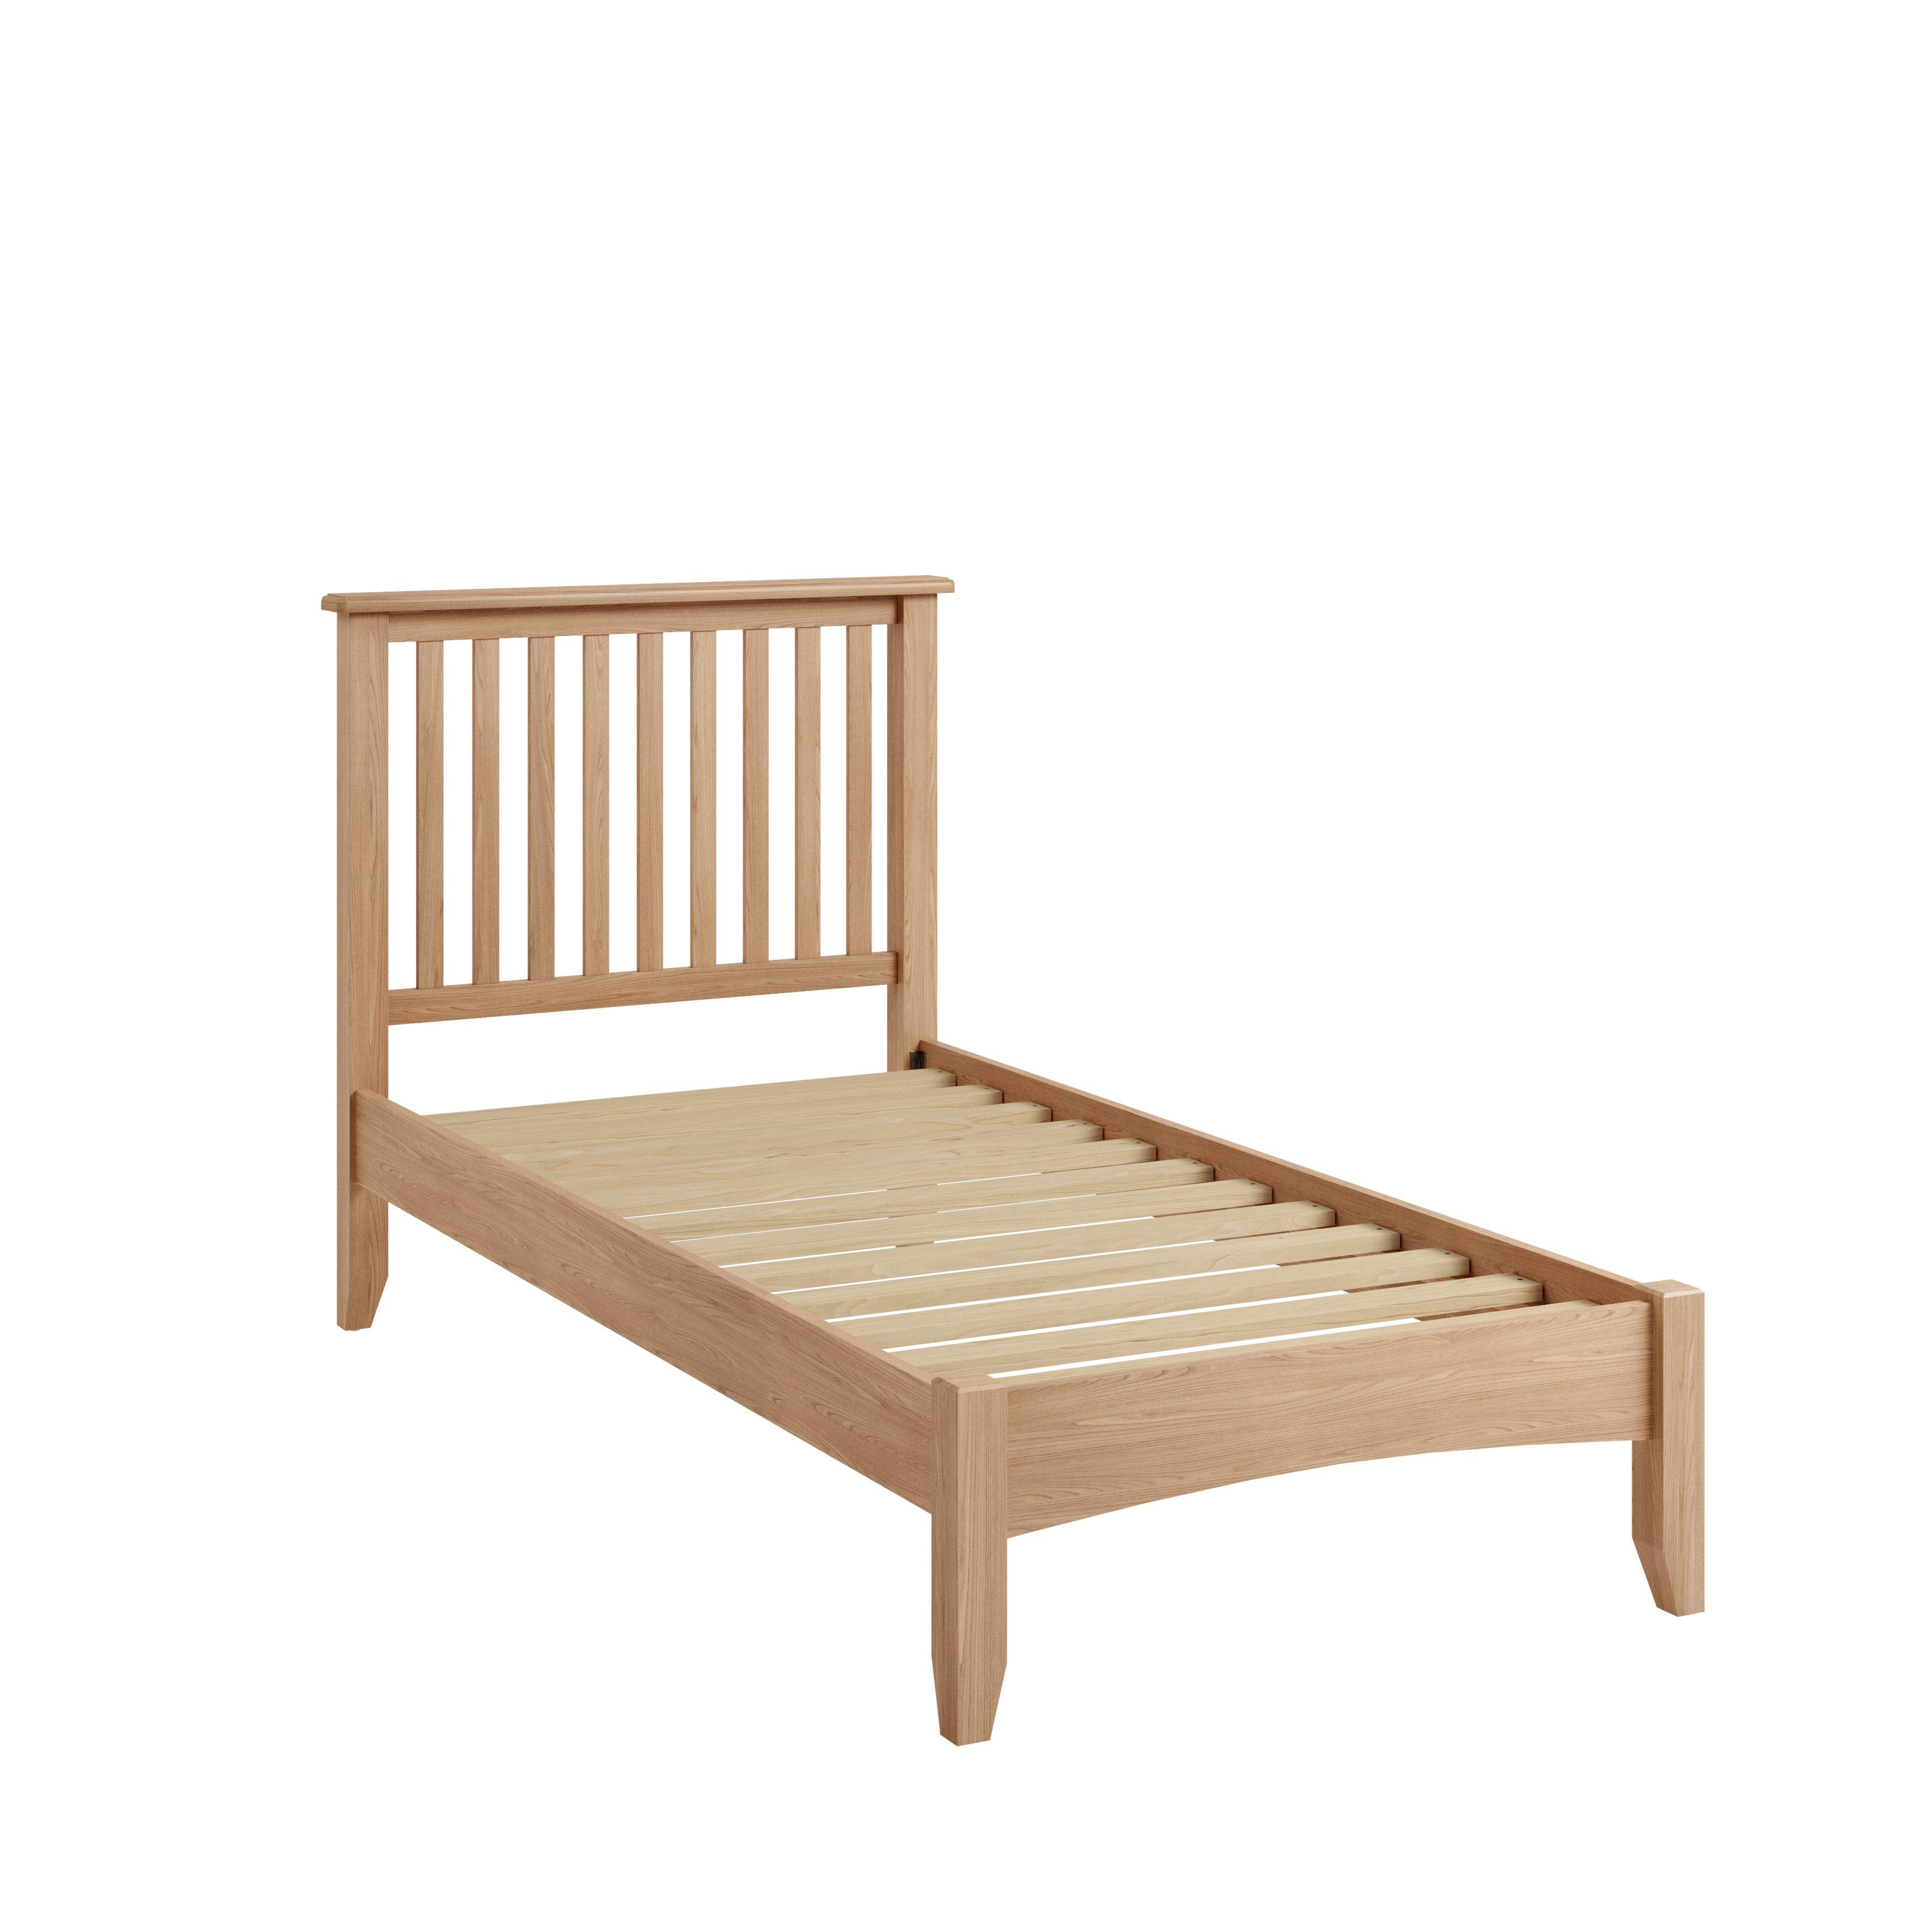 "GARTON 3'0"" Bed"